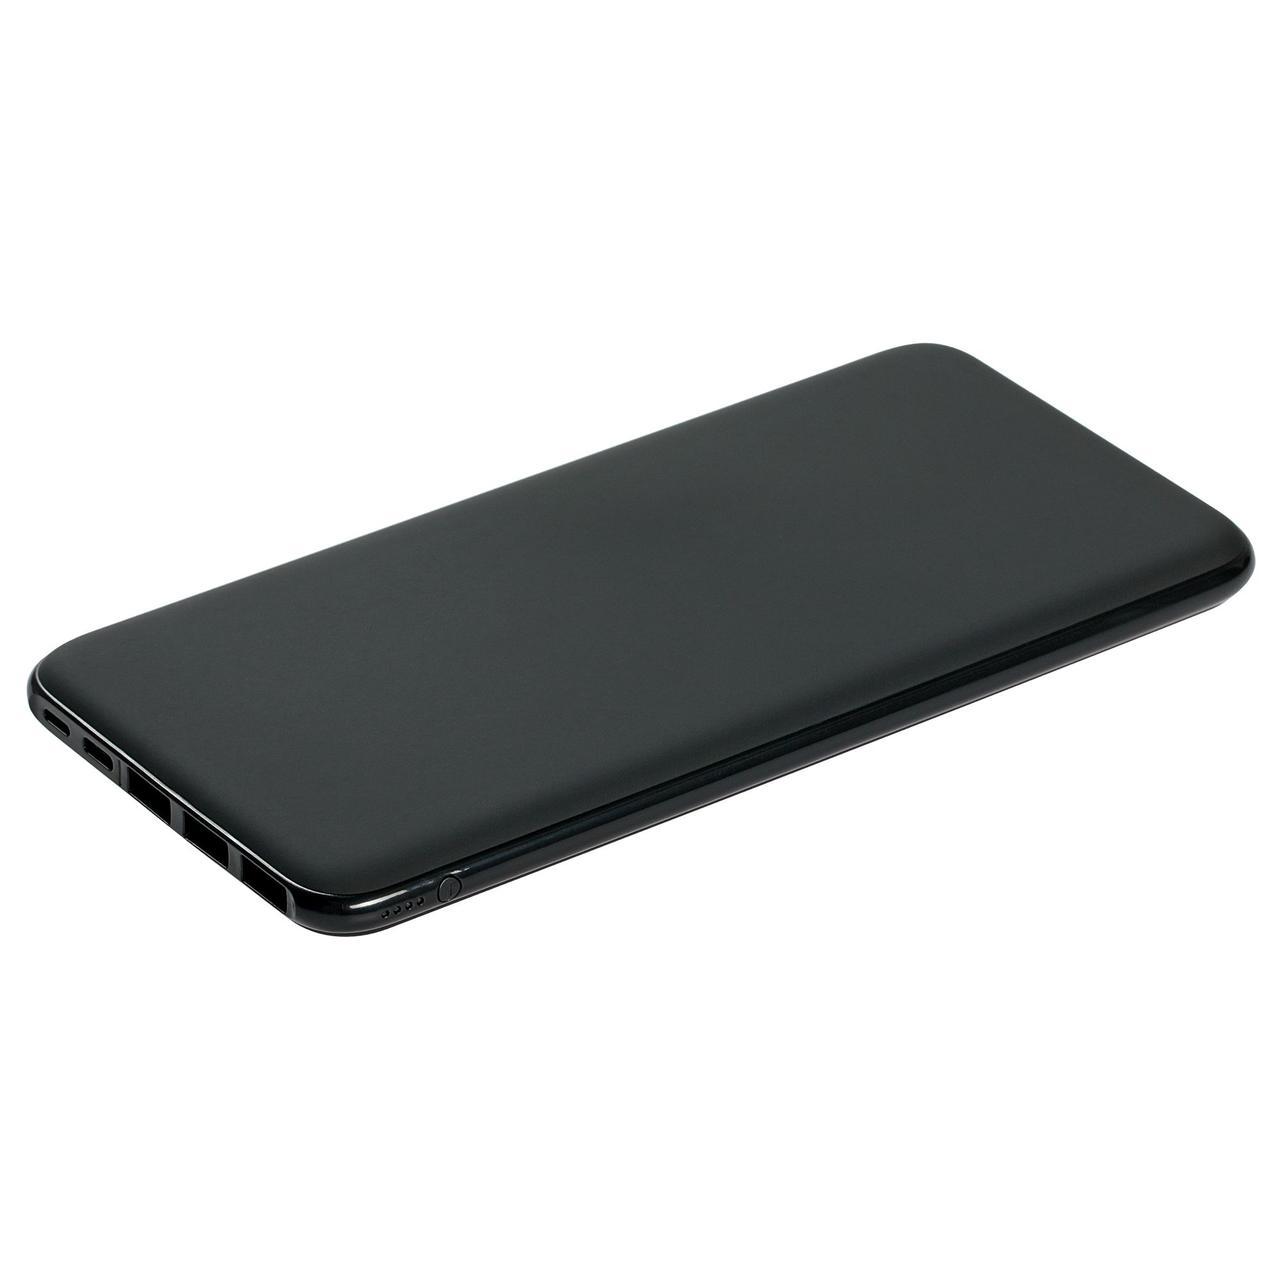 Внешний аккумулятор Uniscend All Day 20 000 мAч, черный (артикул 2310.30)